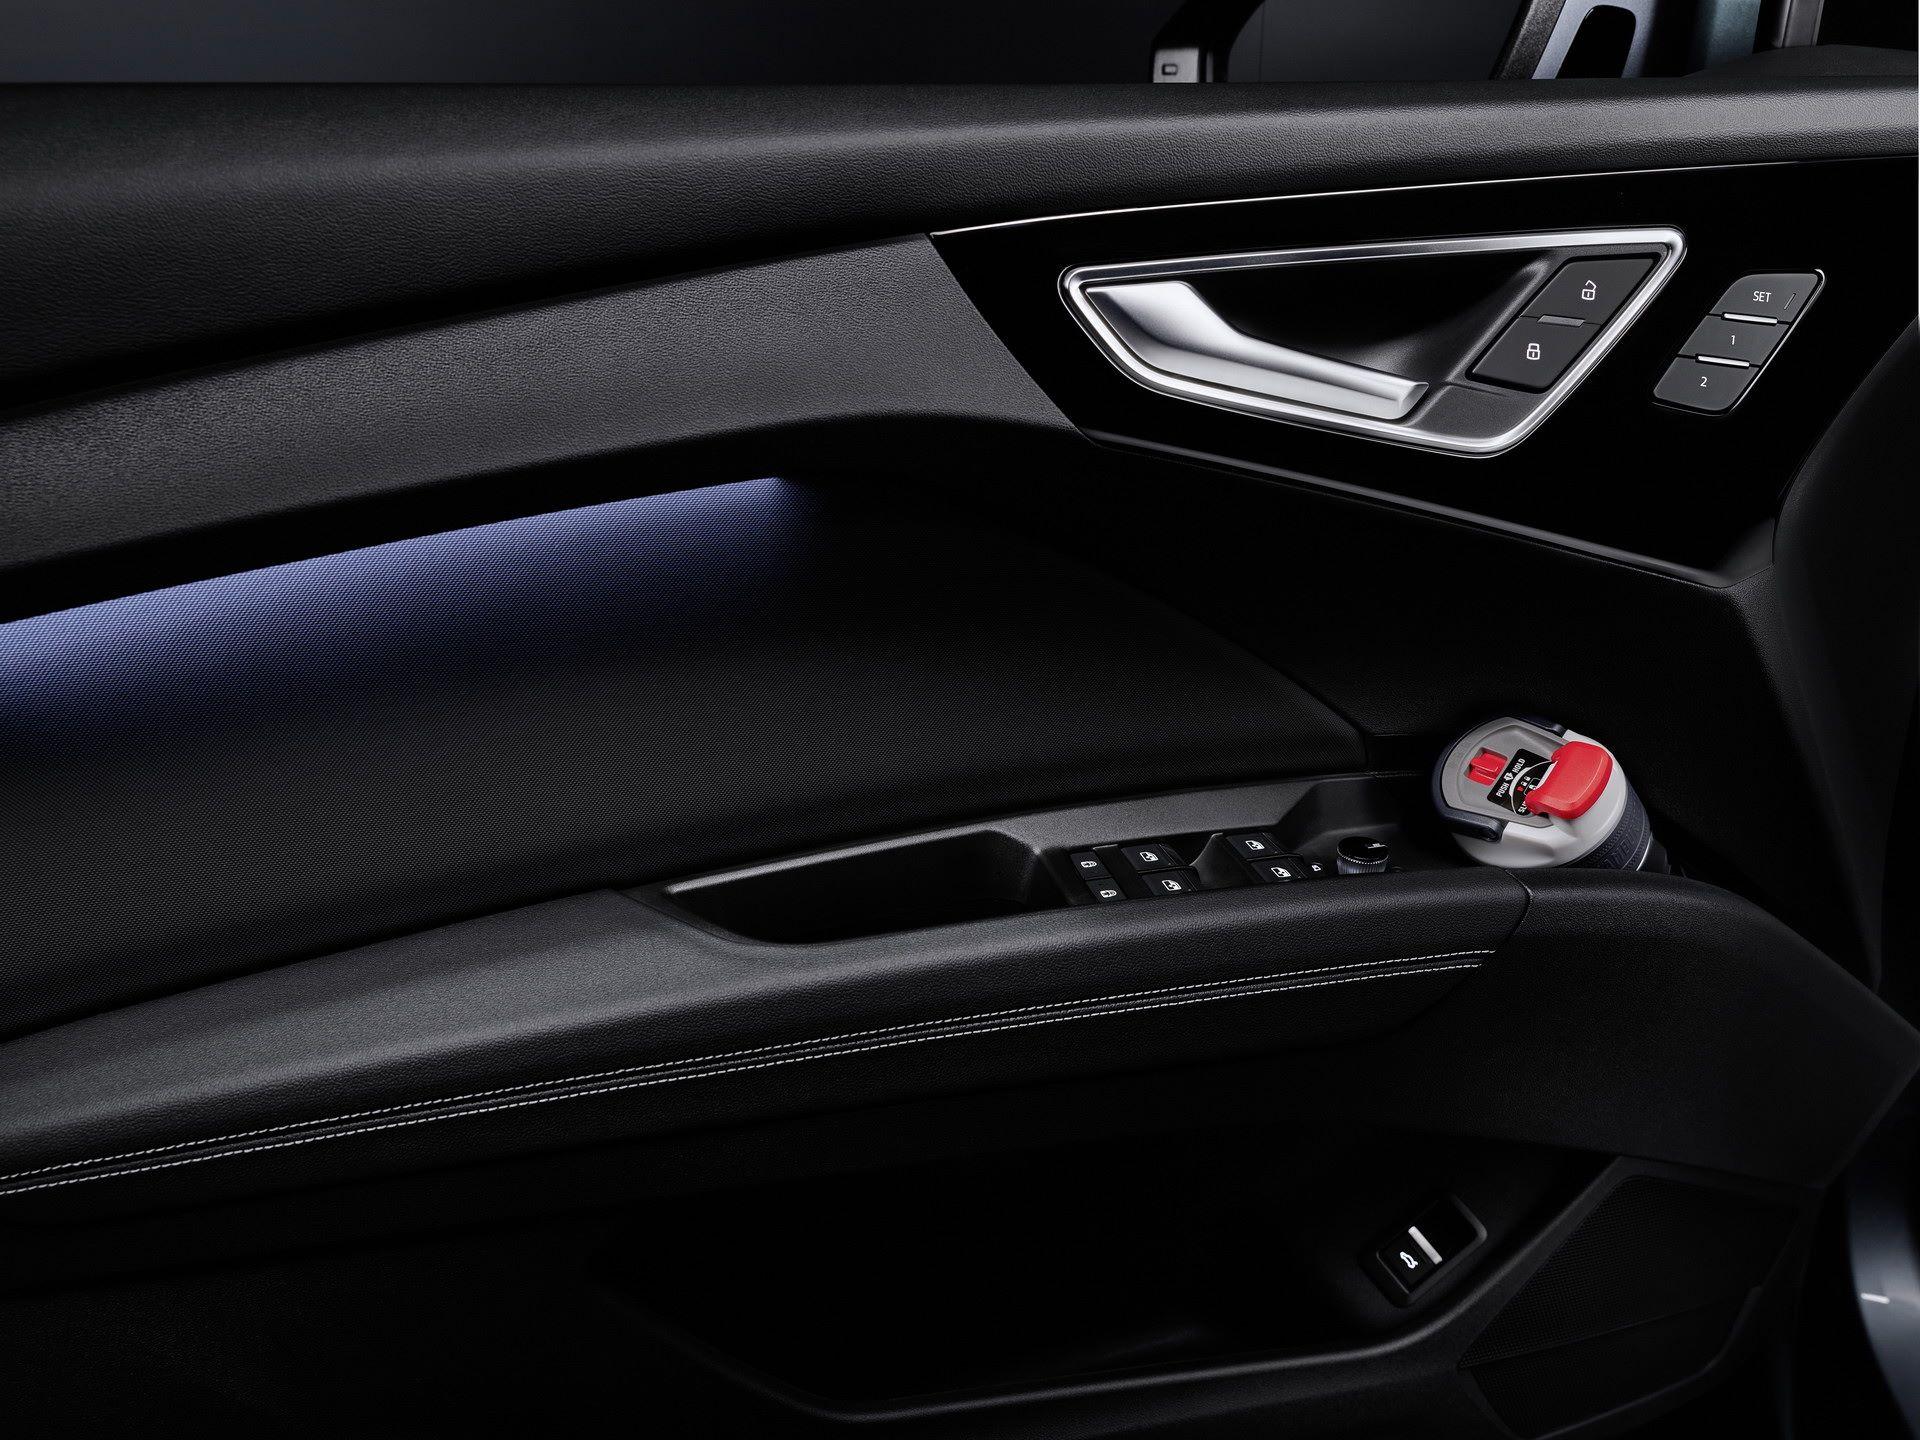 Audi-Q4-e-tron-and-Q4-e-tron-Sportback-90